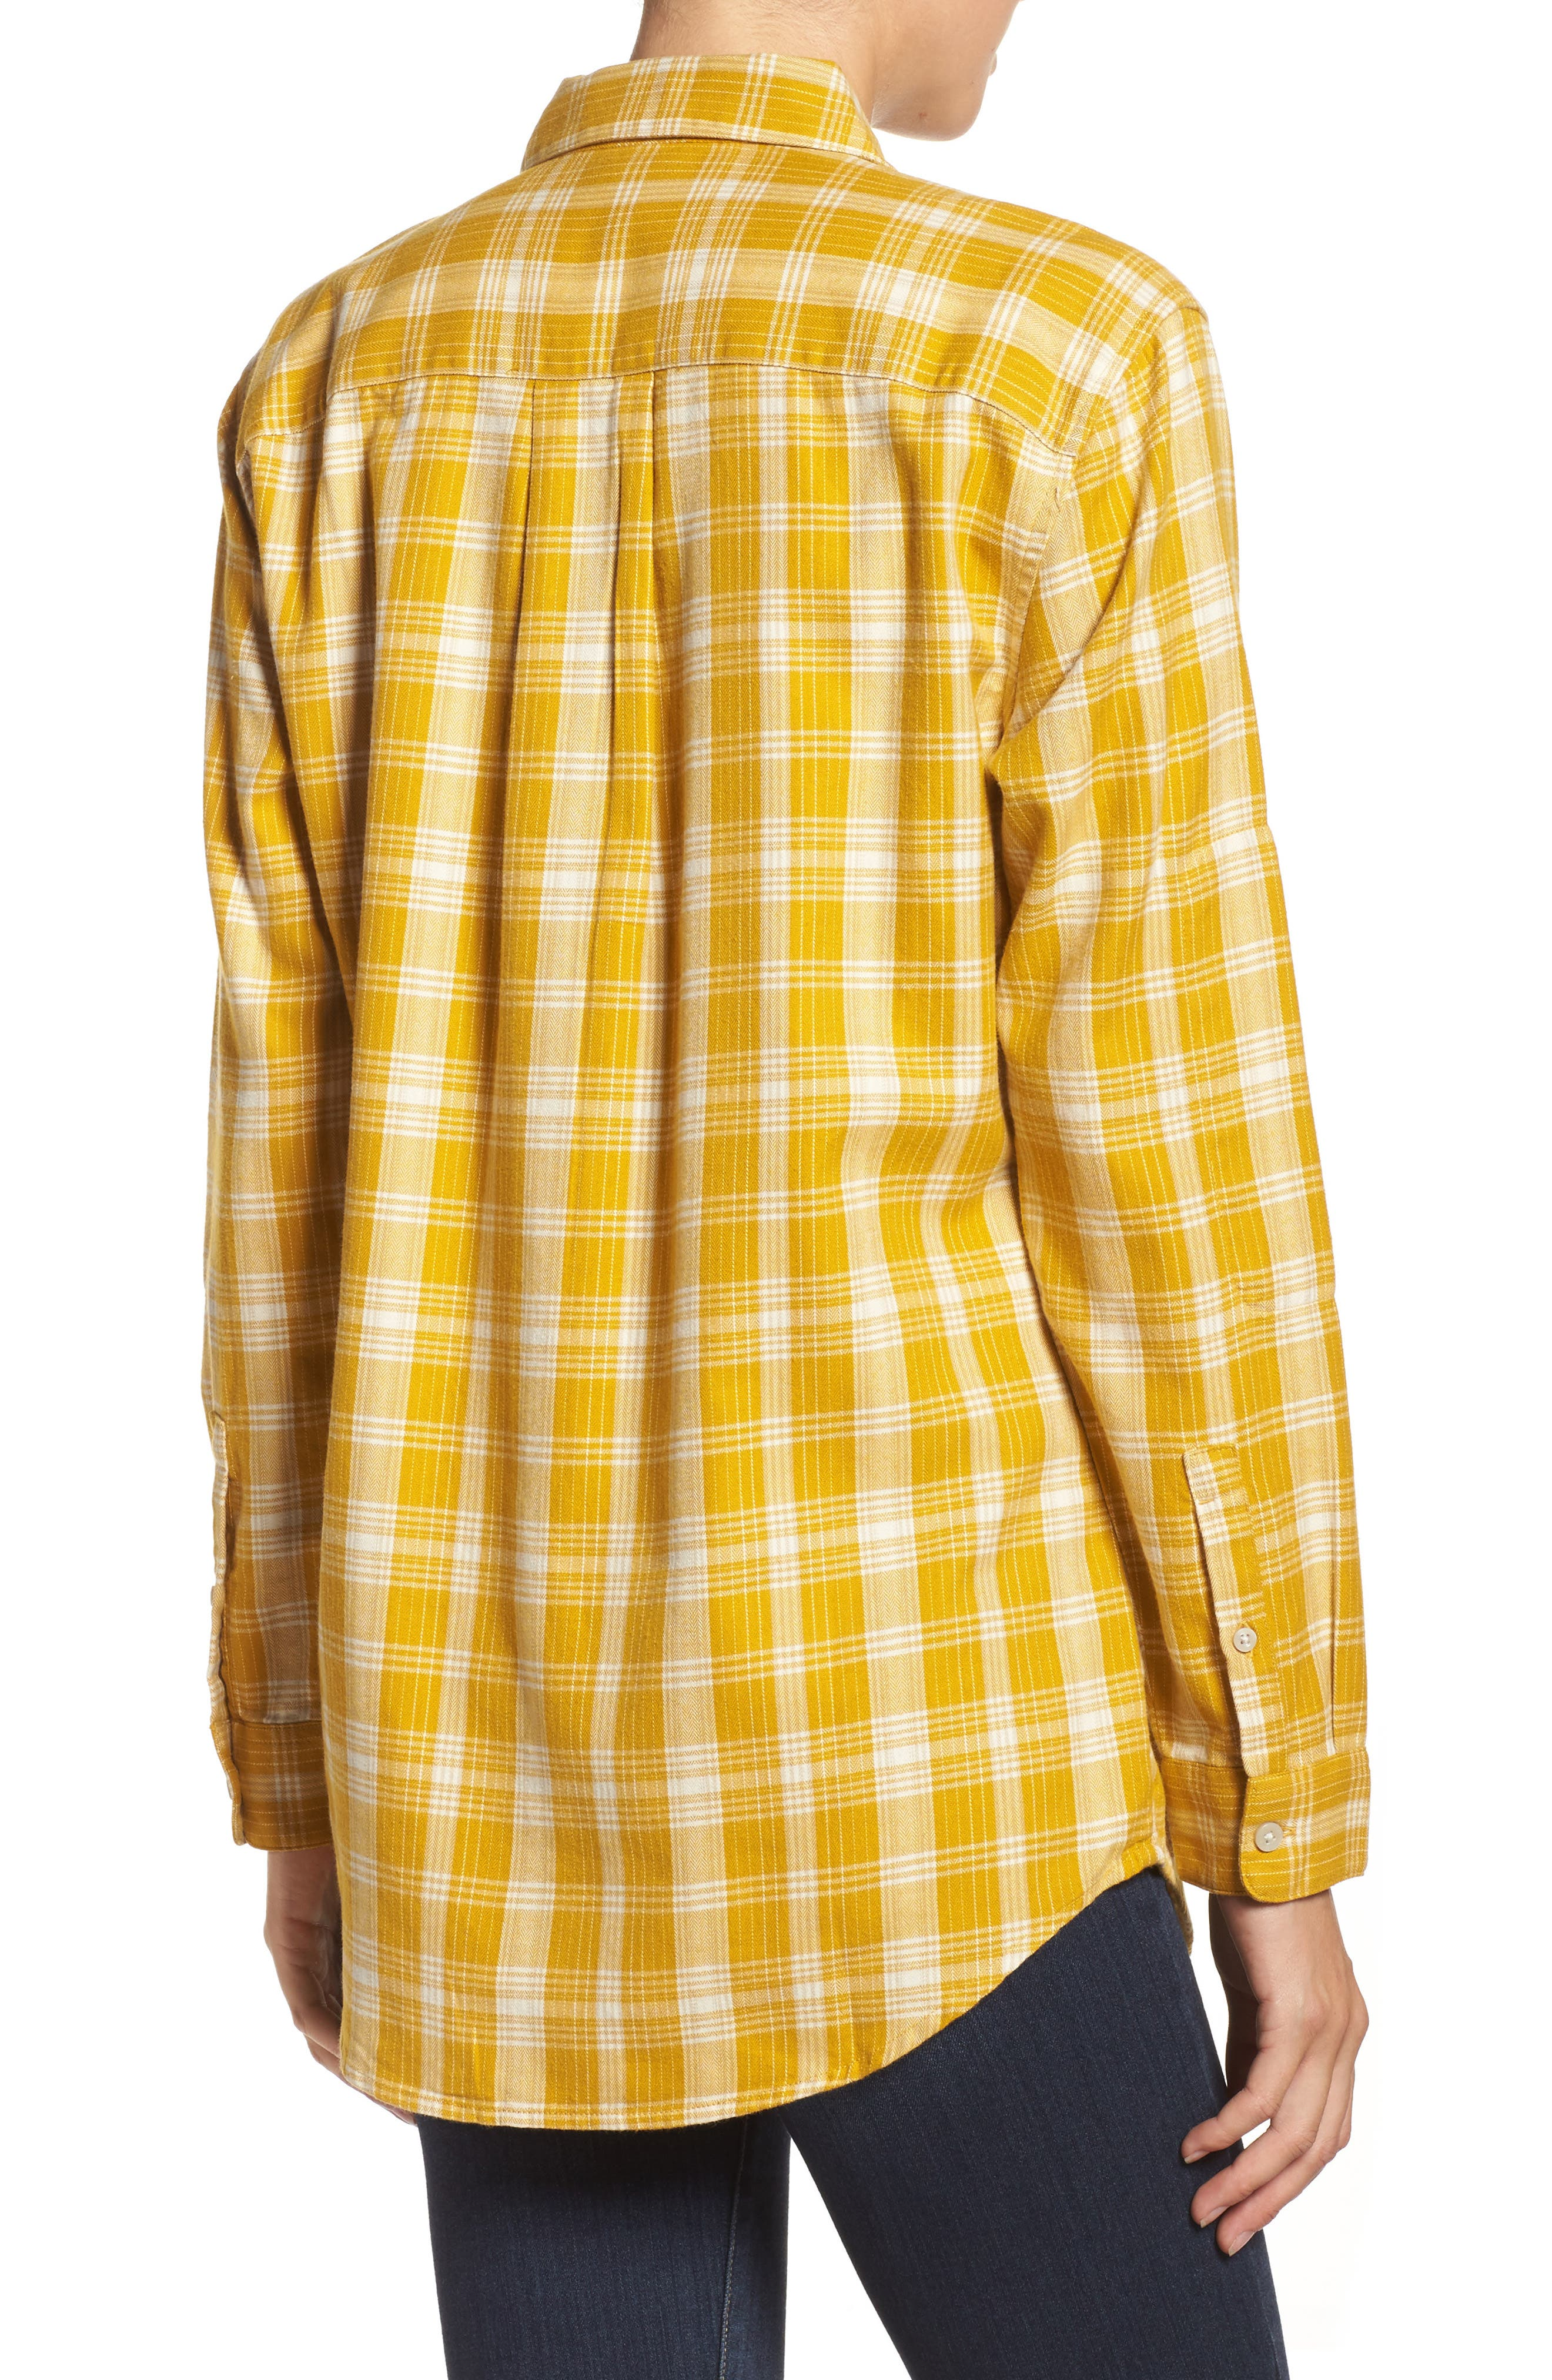 Boyfriend Shirt,                             Alternate thumbnail 2, color,                             Arrowwood Yellow Plaid